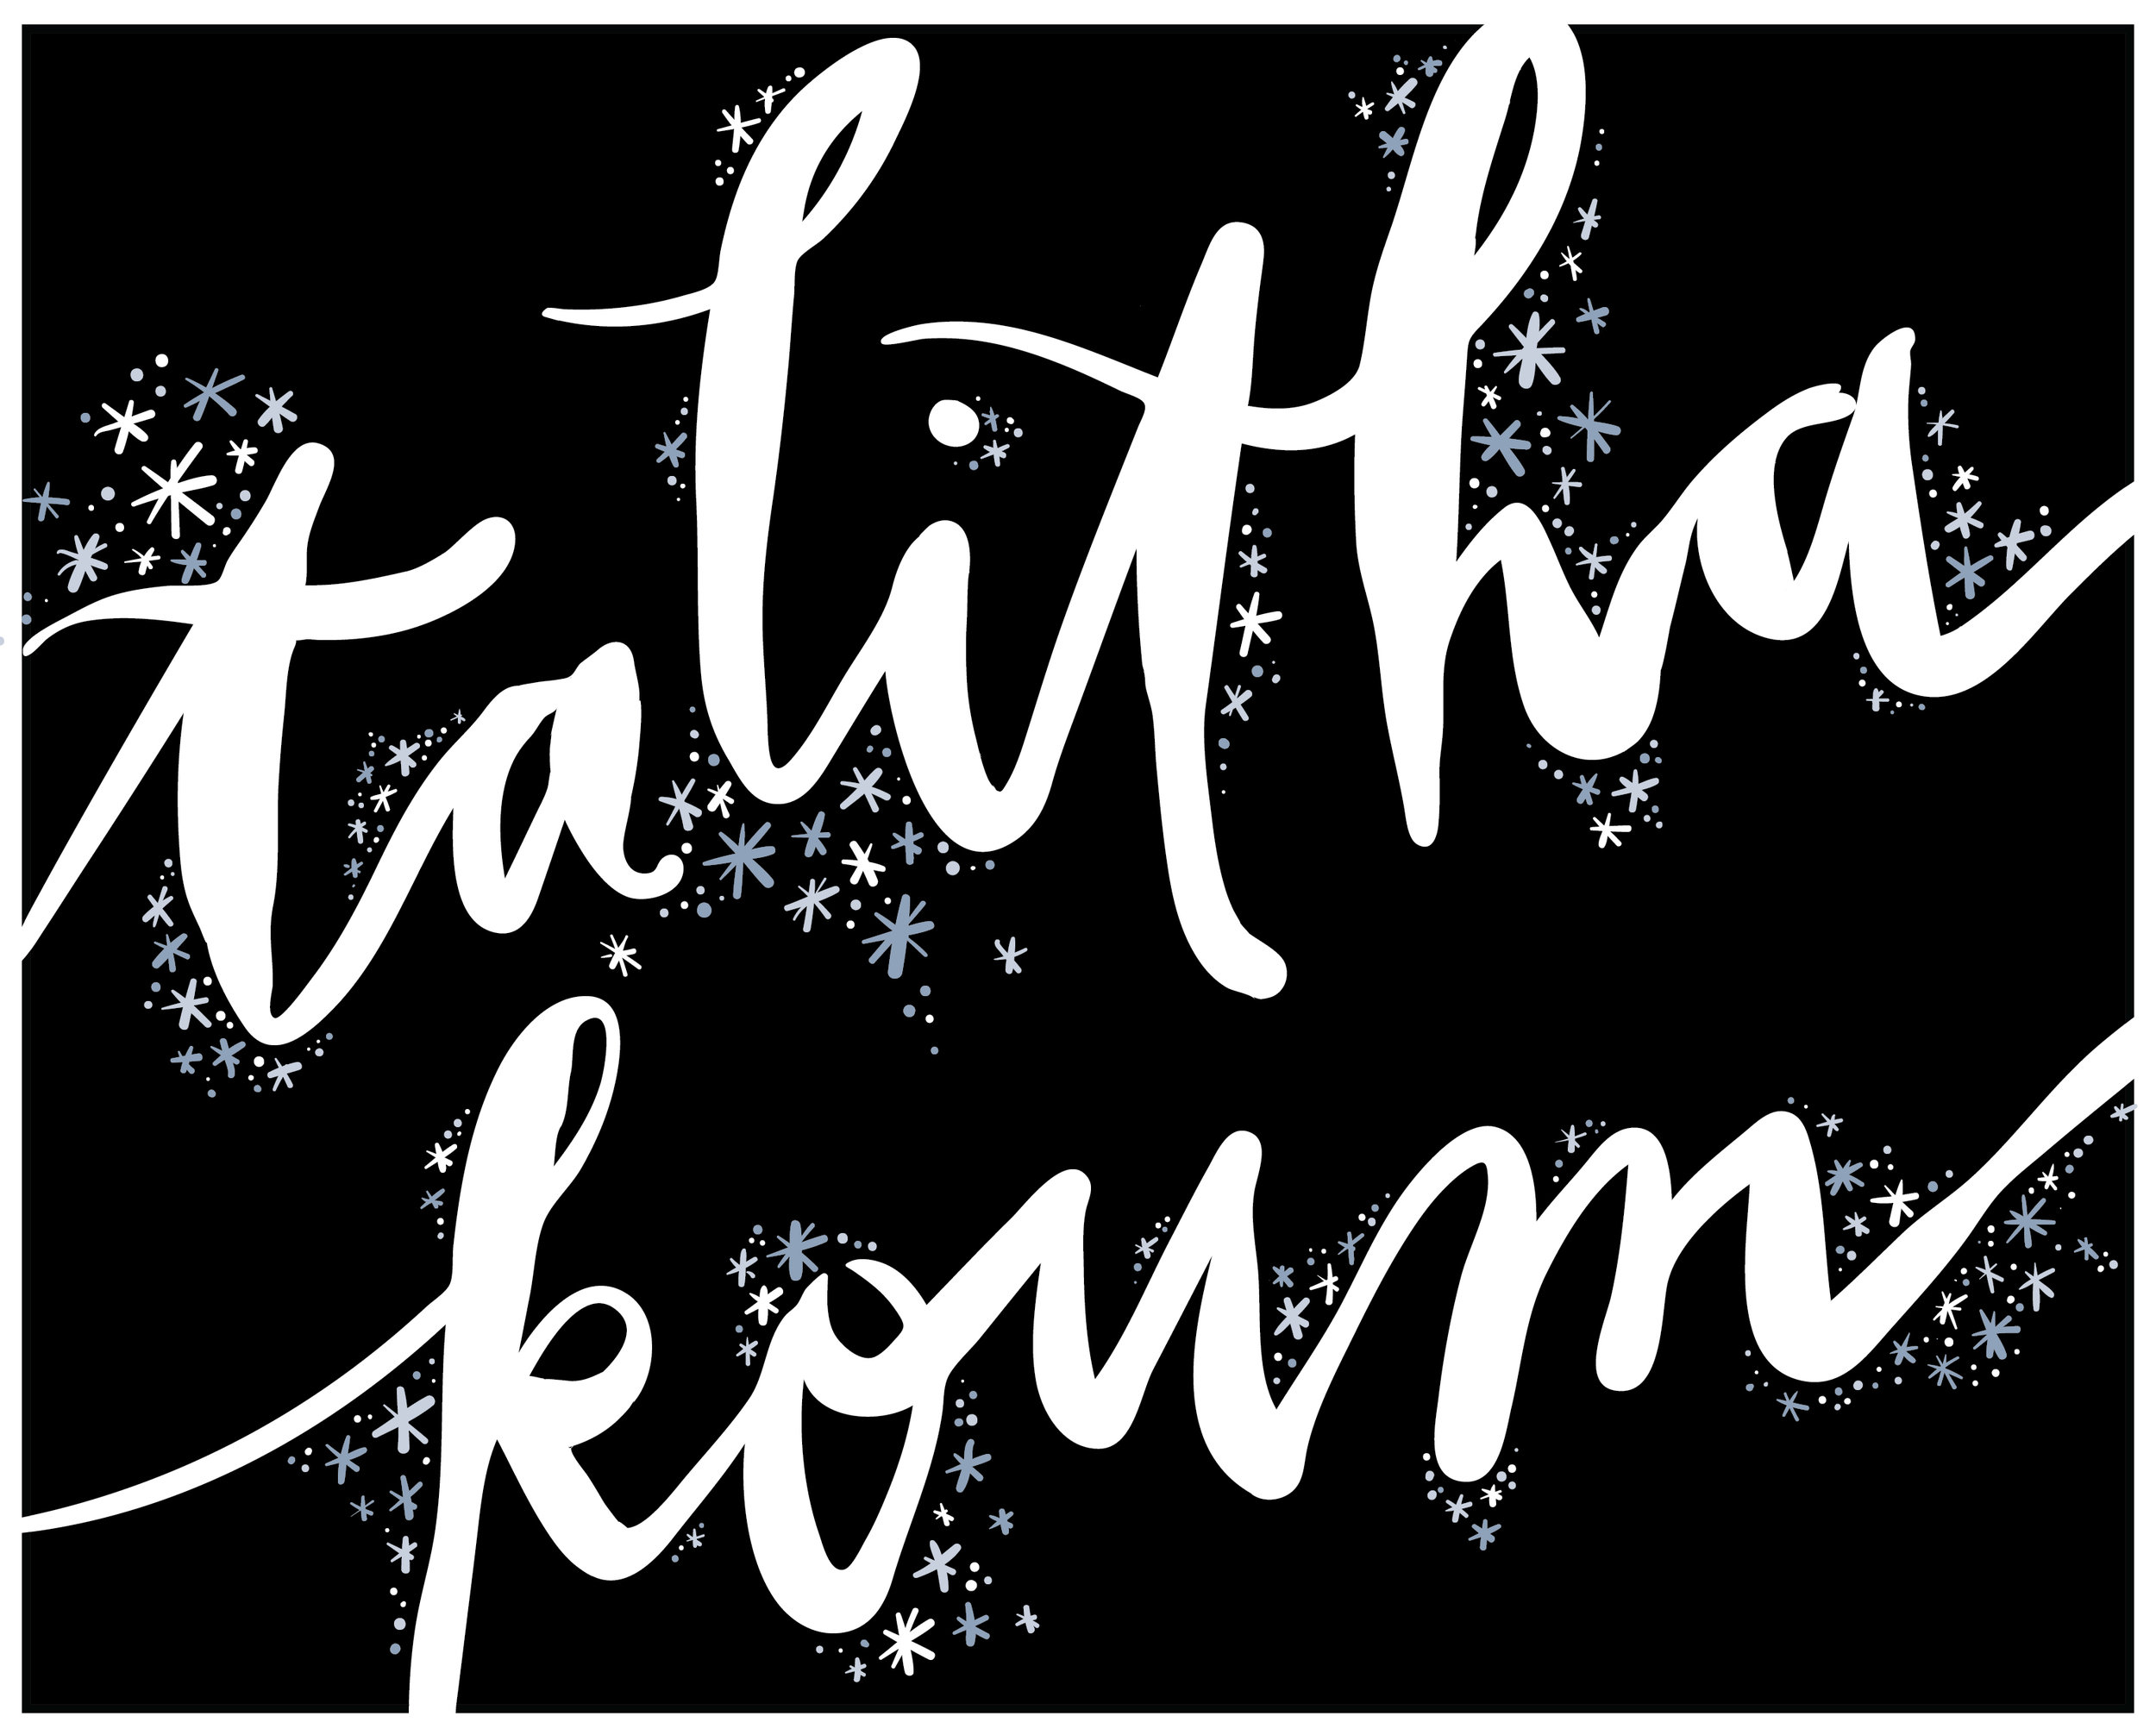 Talitha_Koum-01.jpg